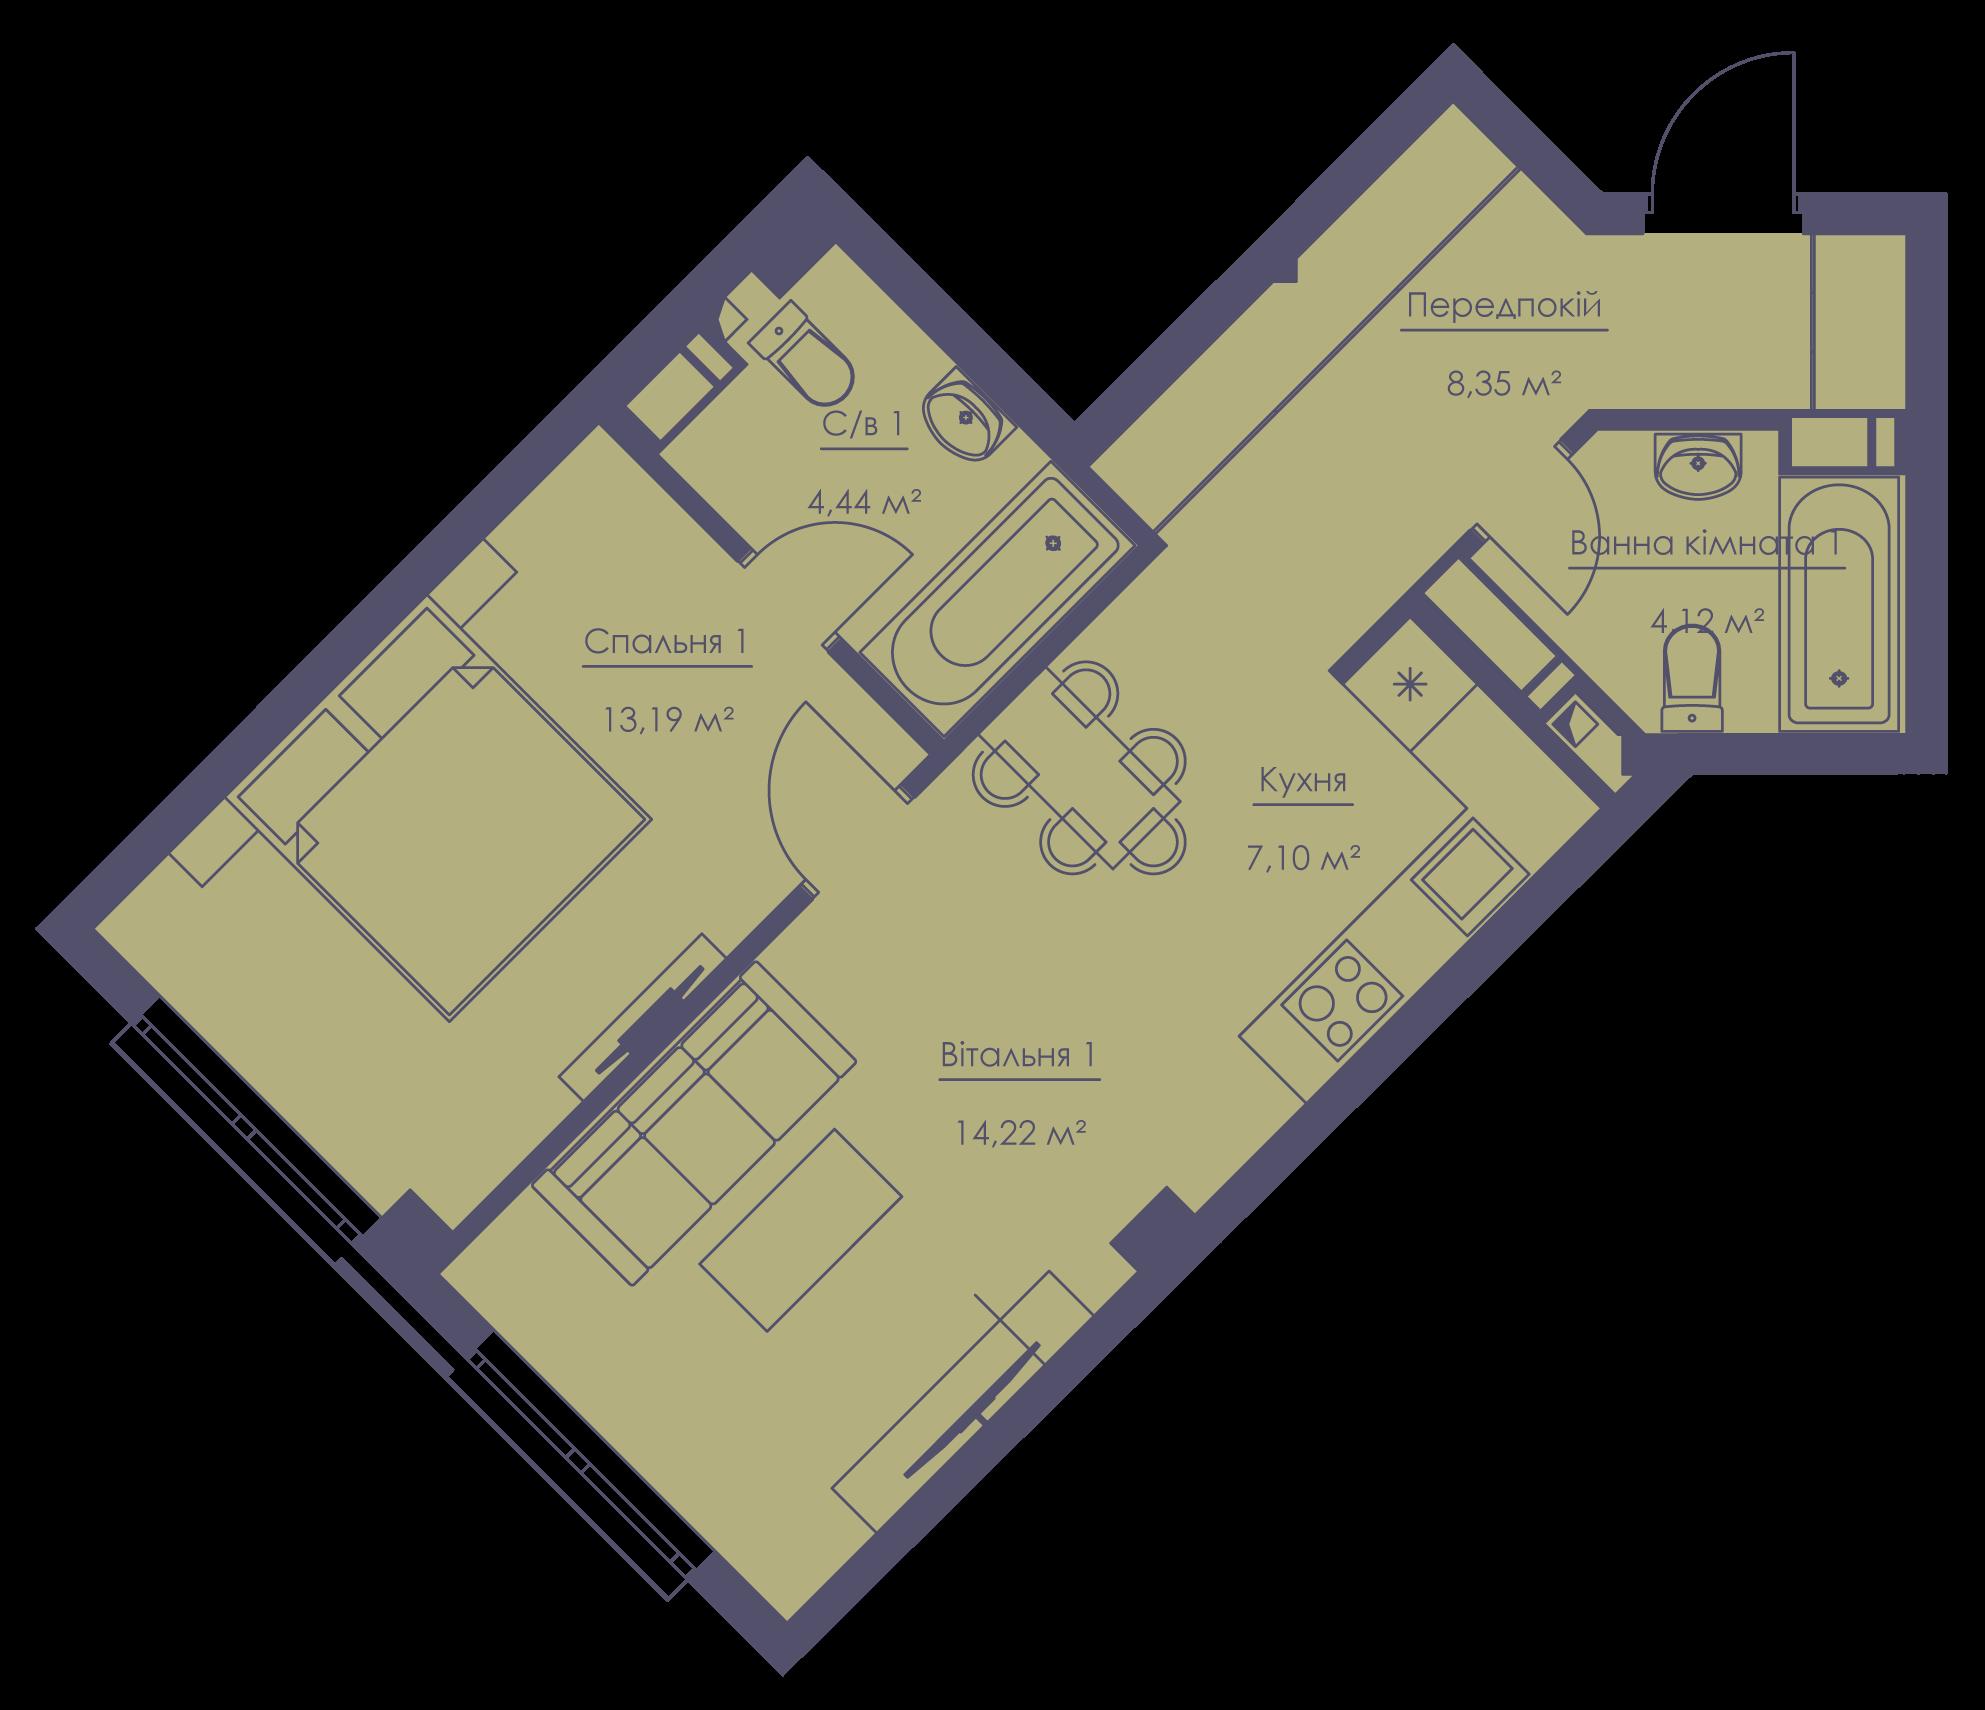 Apartment layout KV_82_2m_1_1_3-1